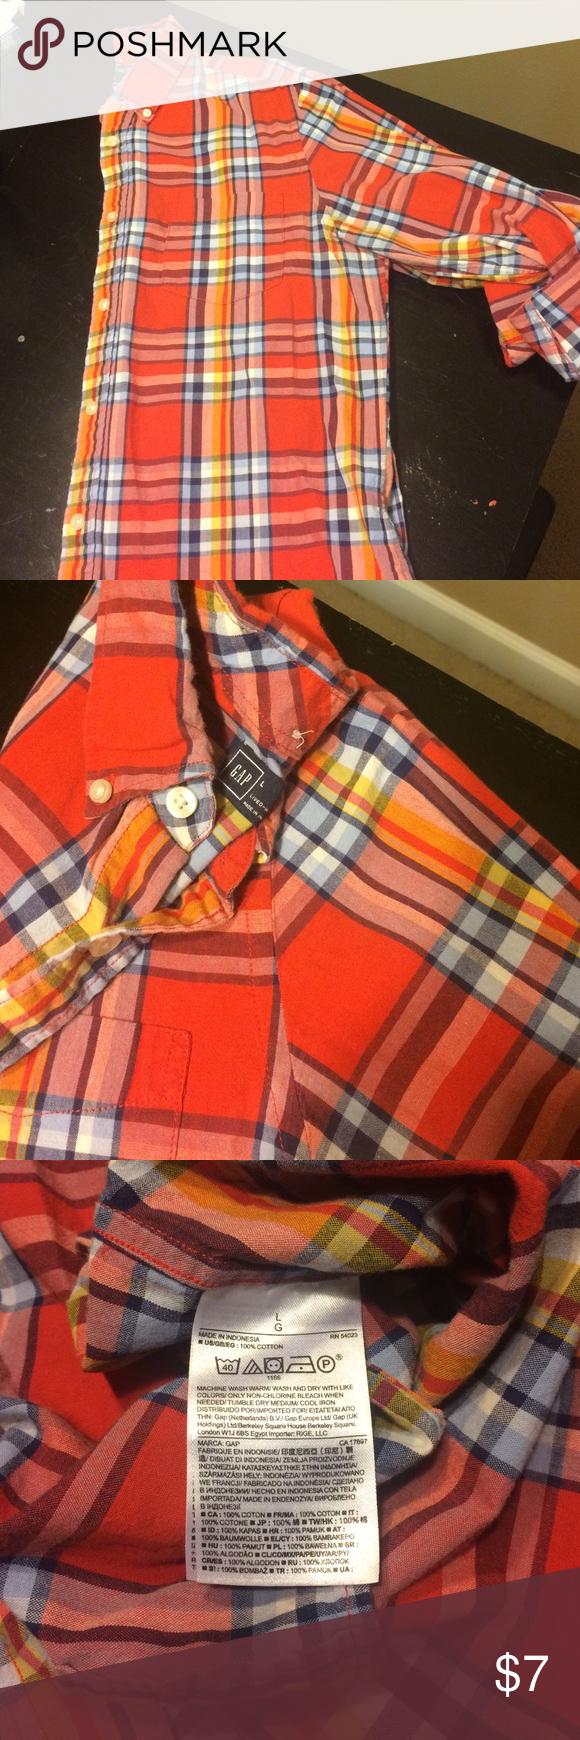 Men's Gap long sleeve shirt This long sleeve Gap button down is gently worn. GAP Shirts Casual Button Down Shirts